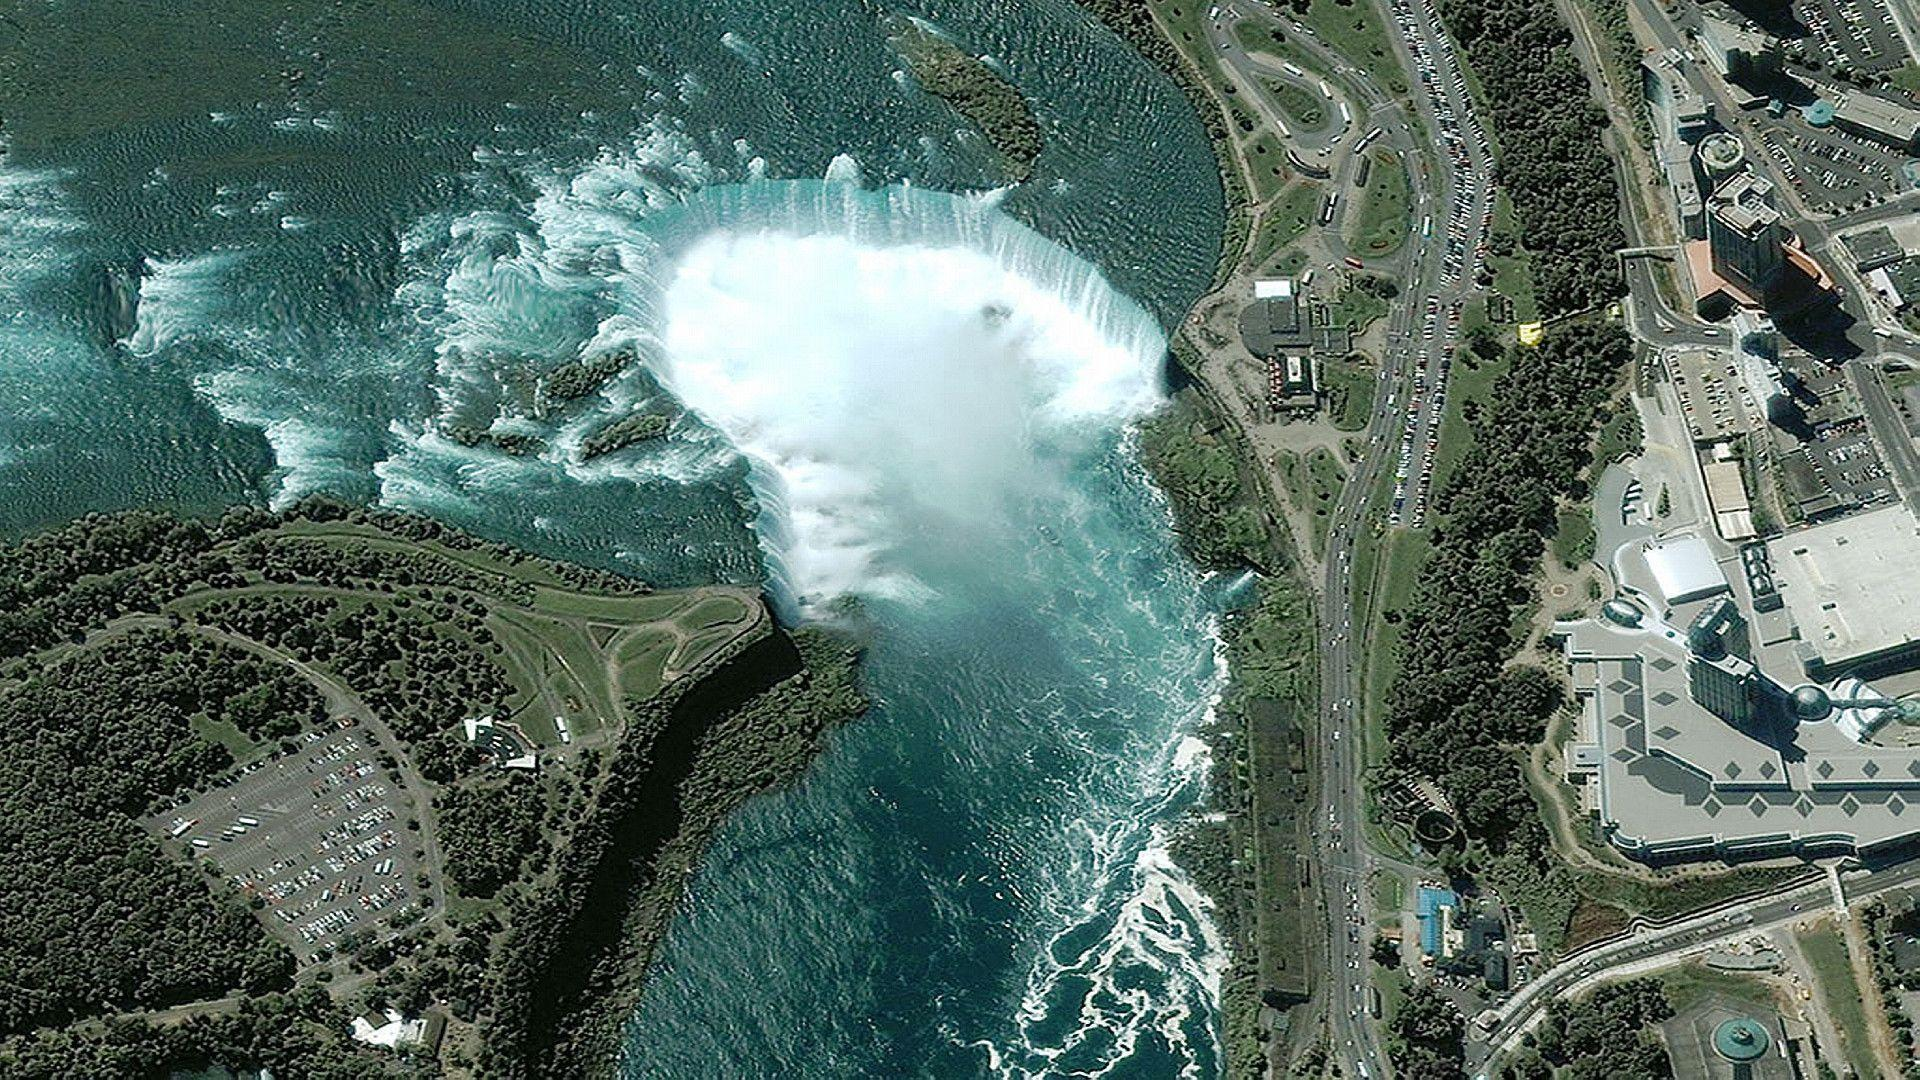 Niagara Water Falls Desktop Wallpaper Niagara Falls Wallpapers Wallpaper Cave